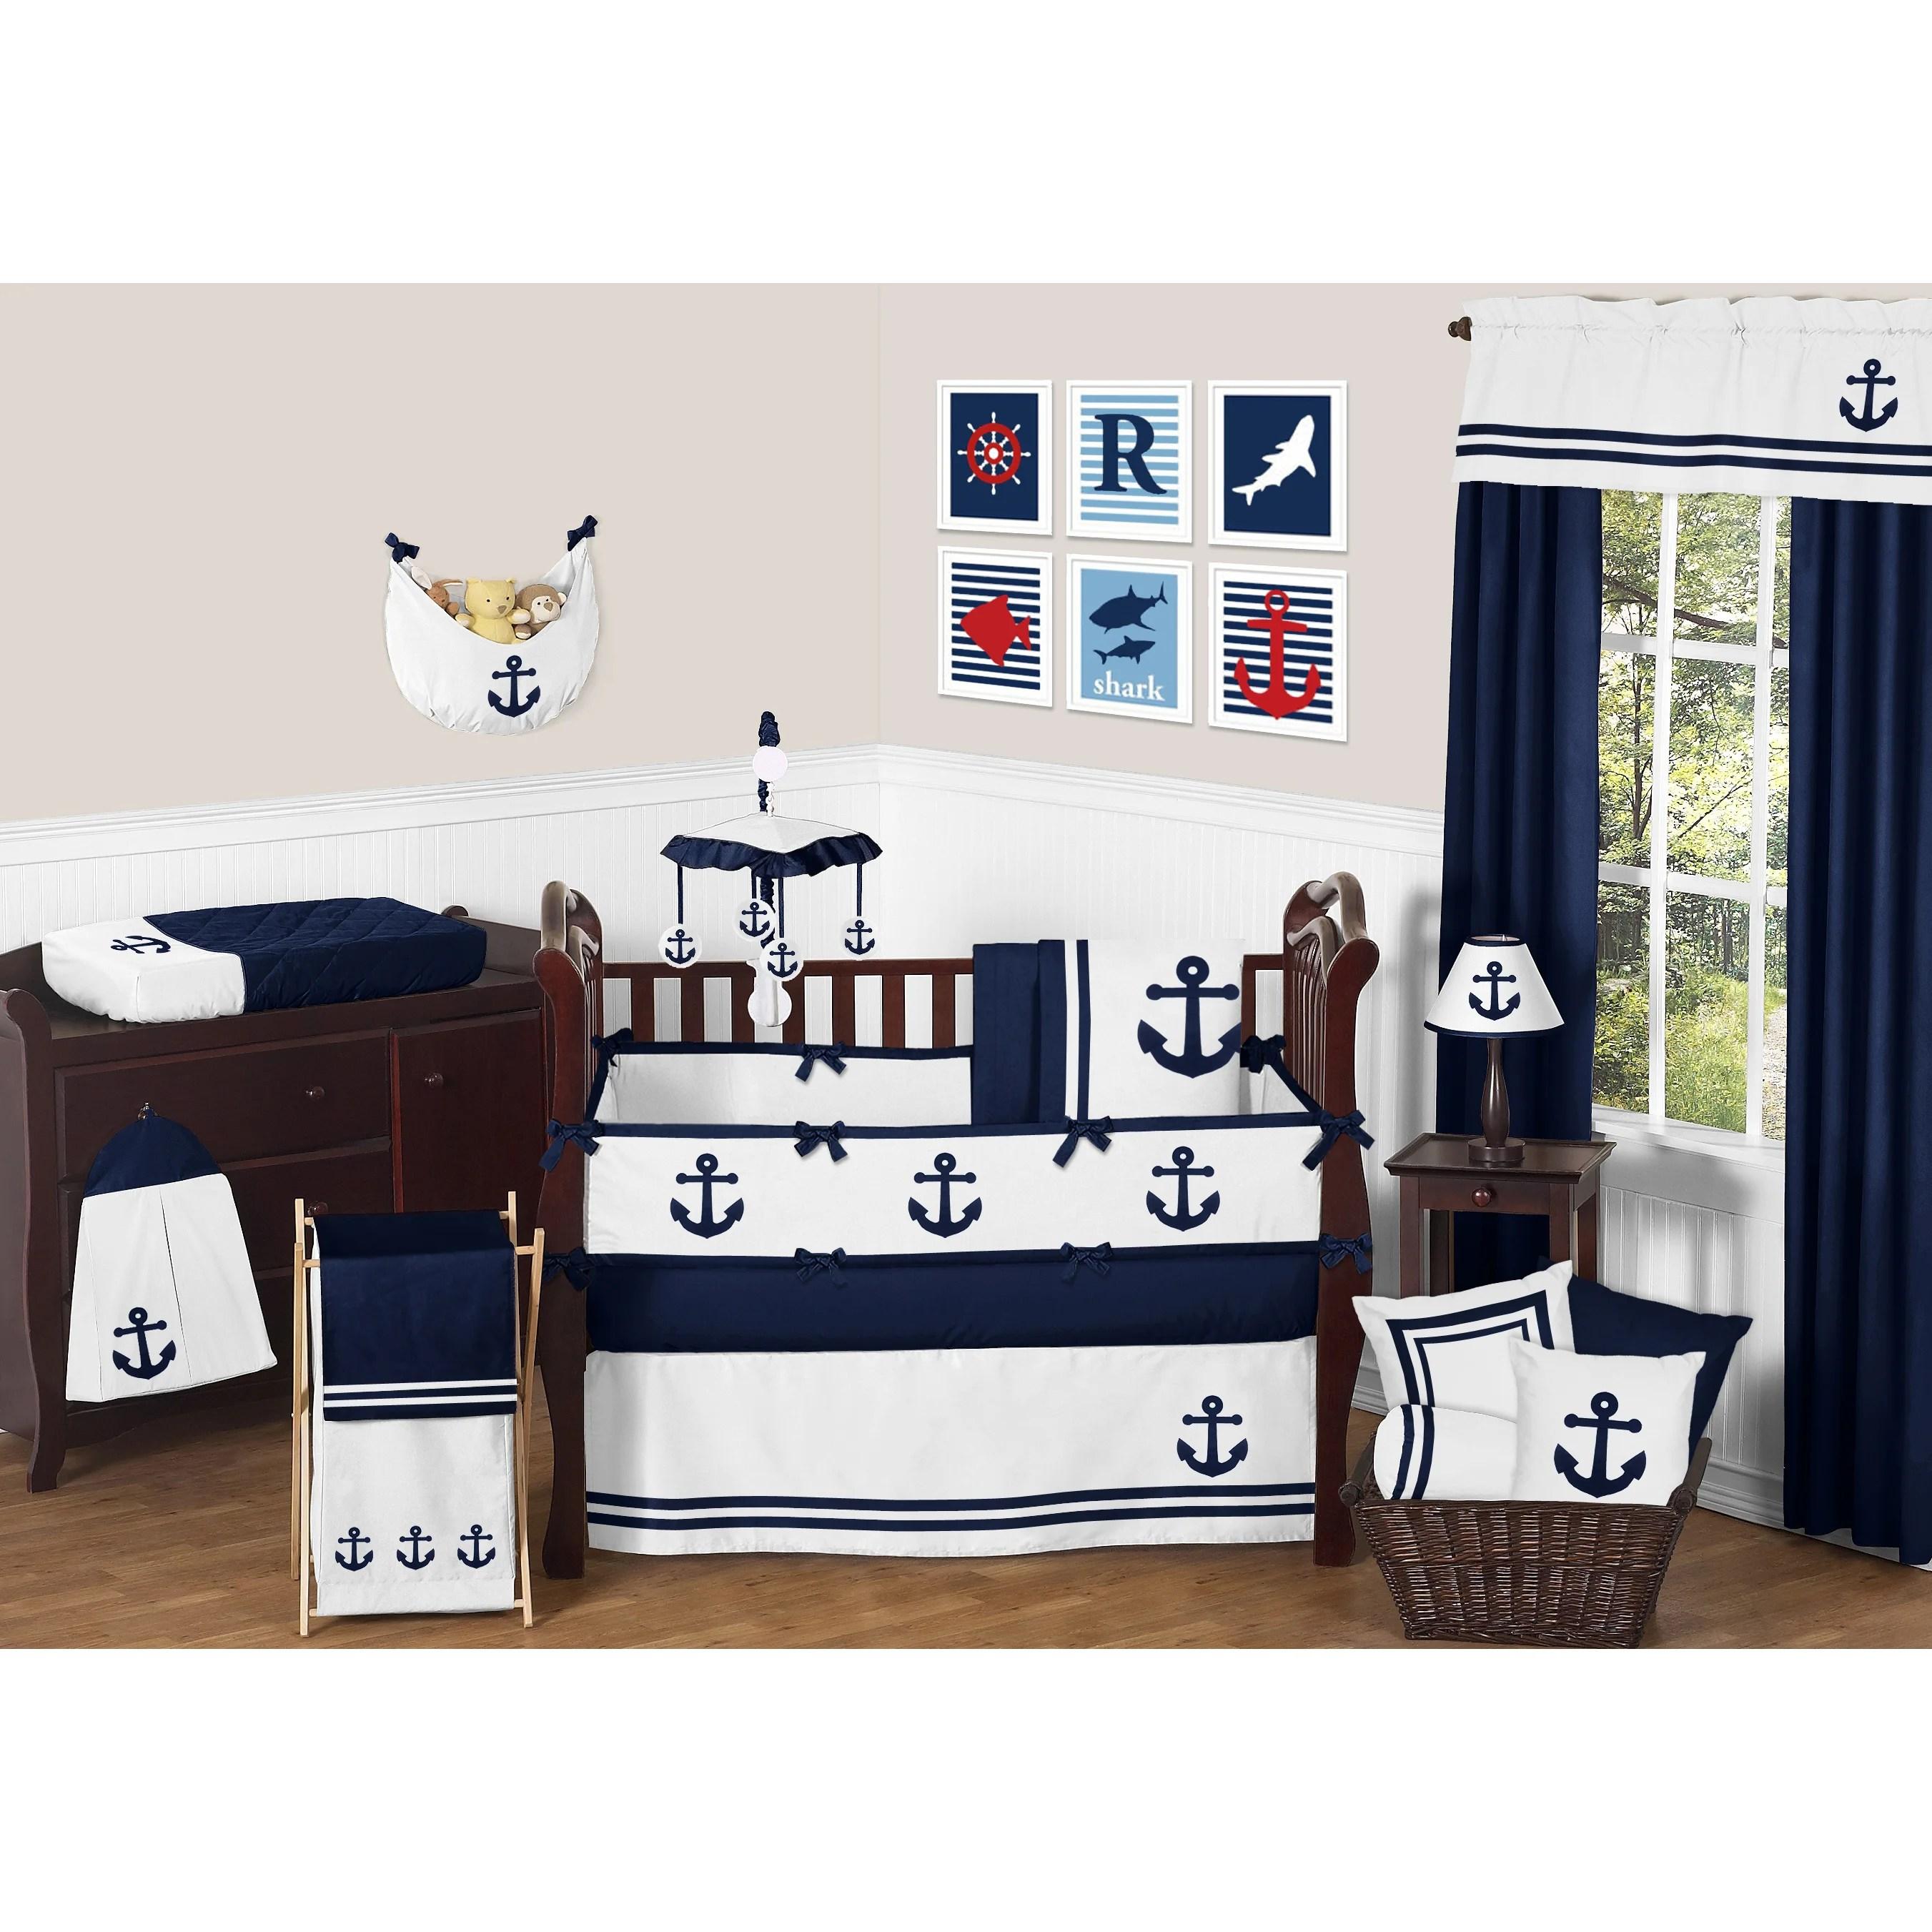 anchor bedroom decor   creatopliste